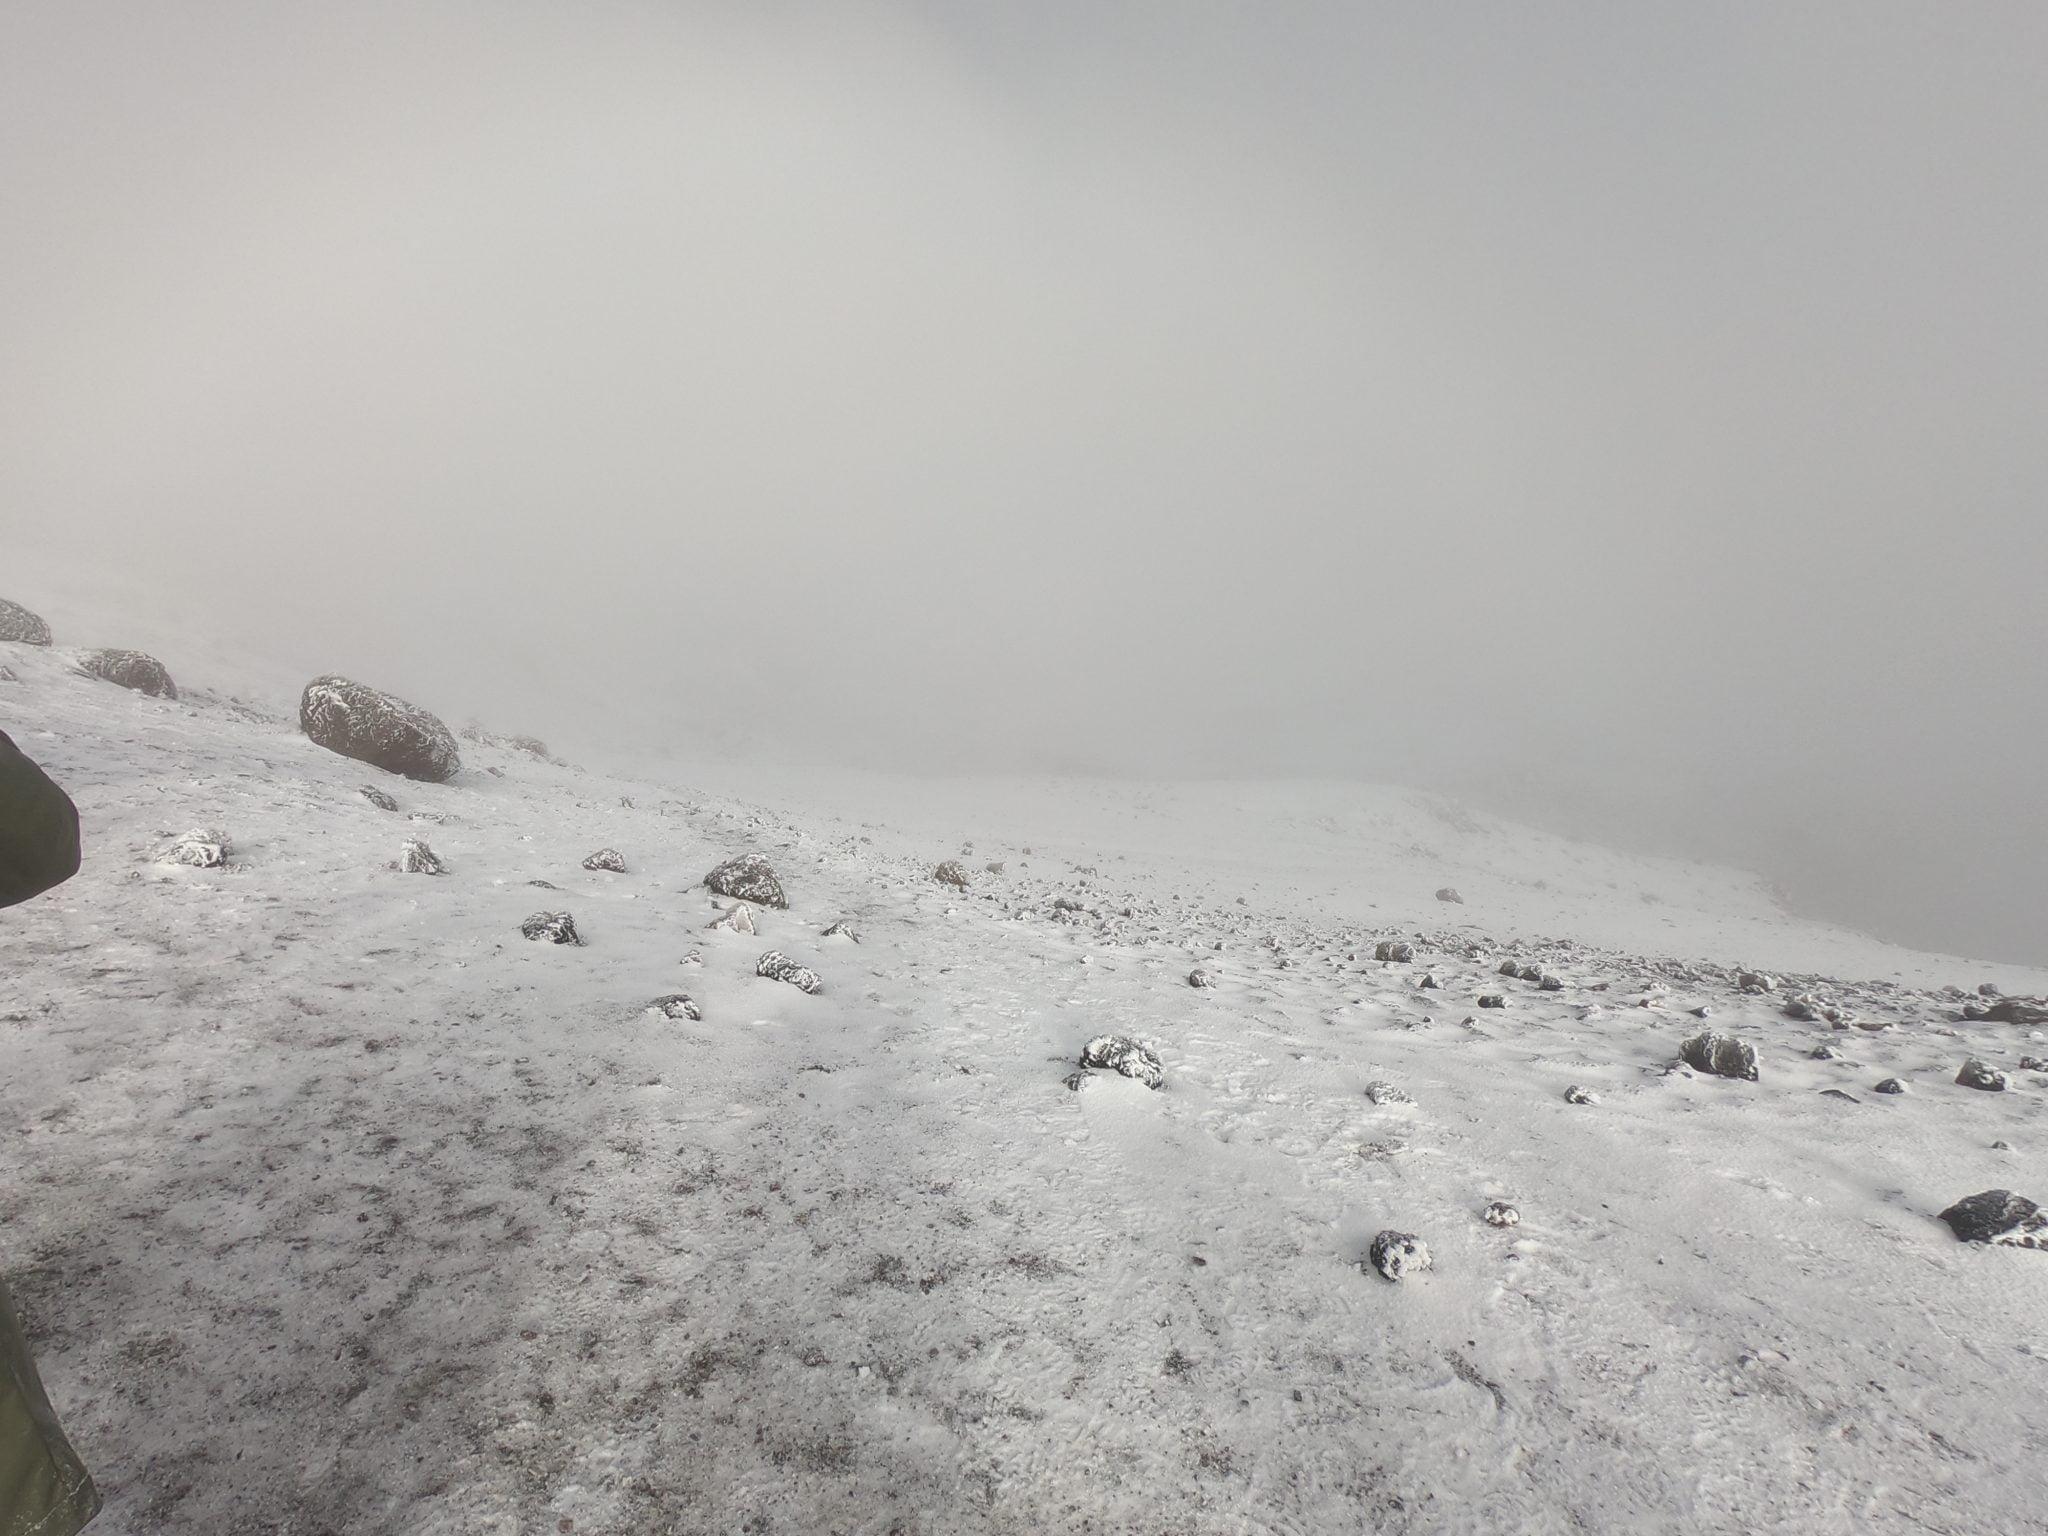 The Summit, Mt Kilimanjaro, Tanzania